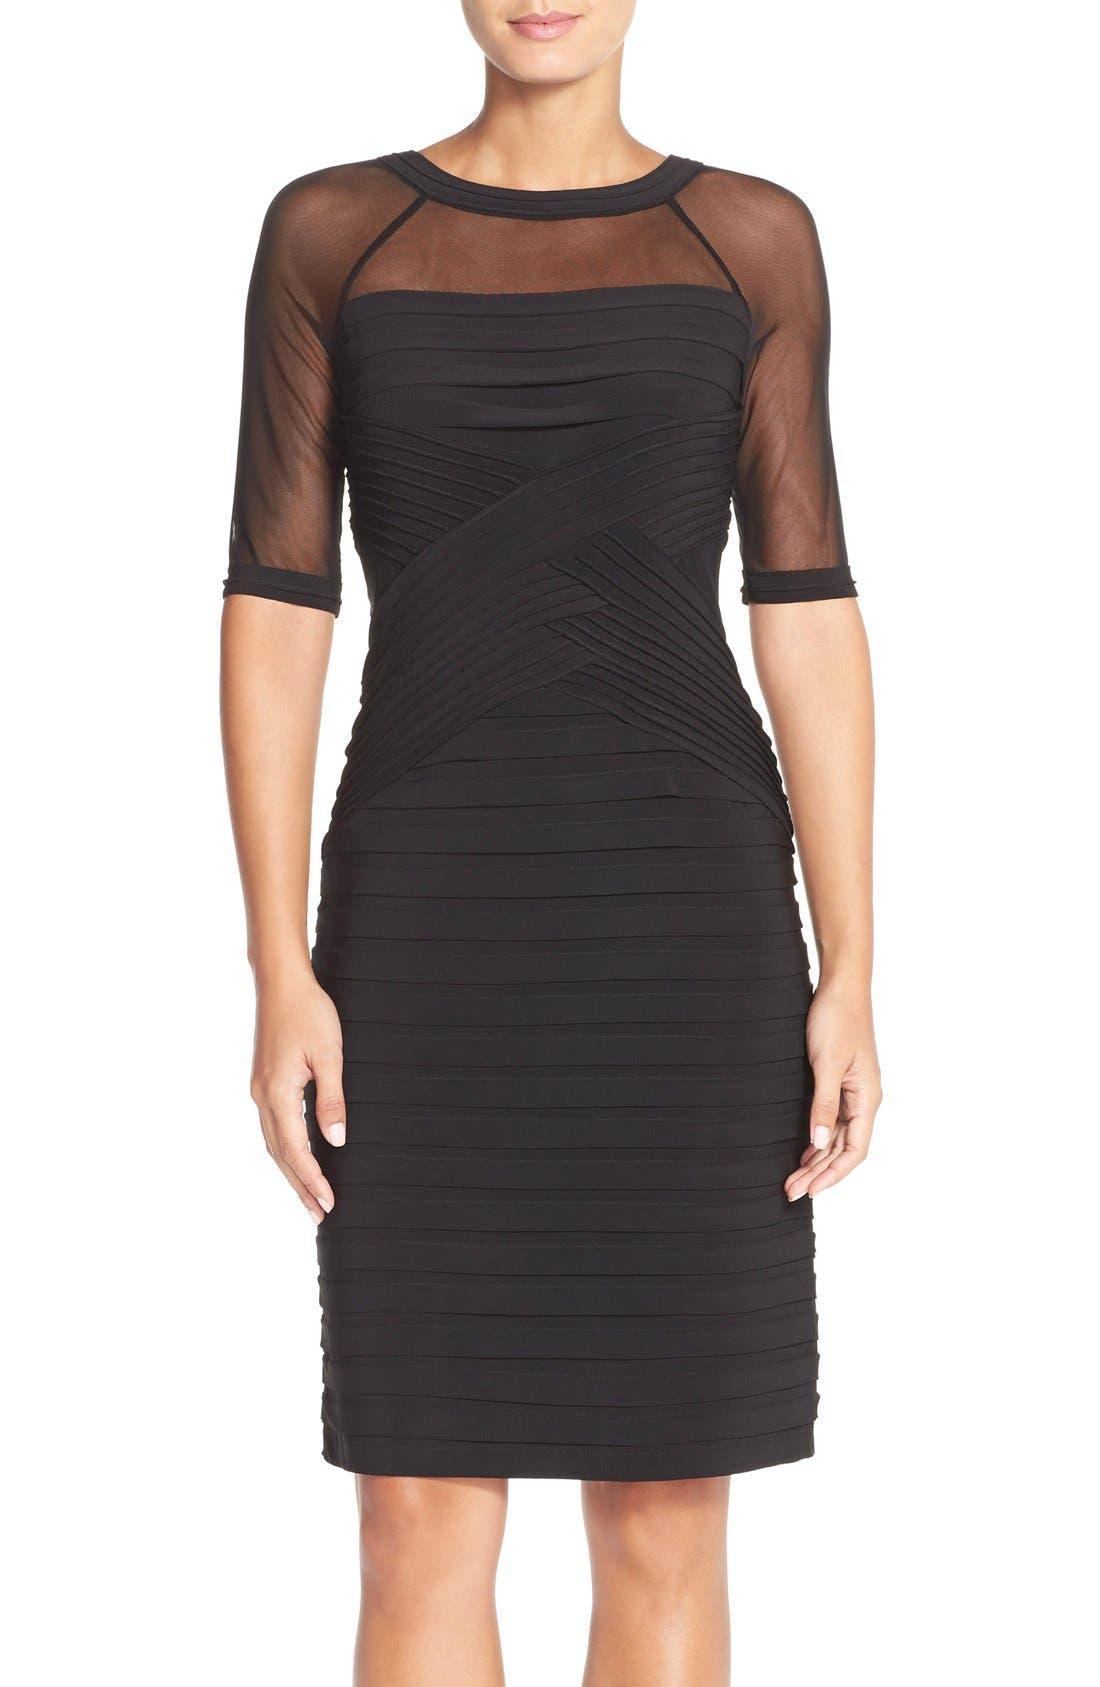 Main Image - Adrianna PapellIllusion Pleated Jersey Shift Dress